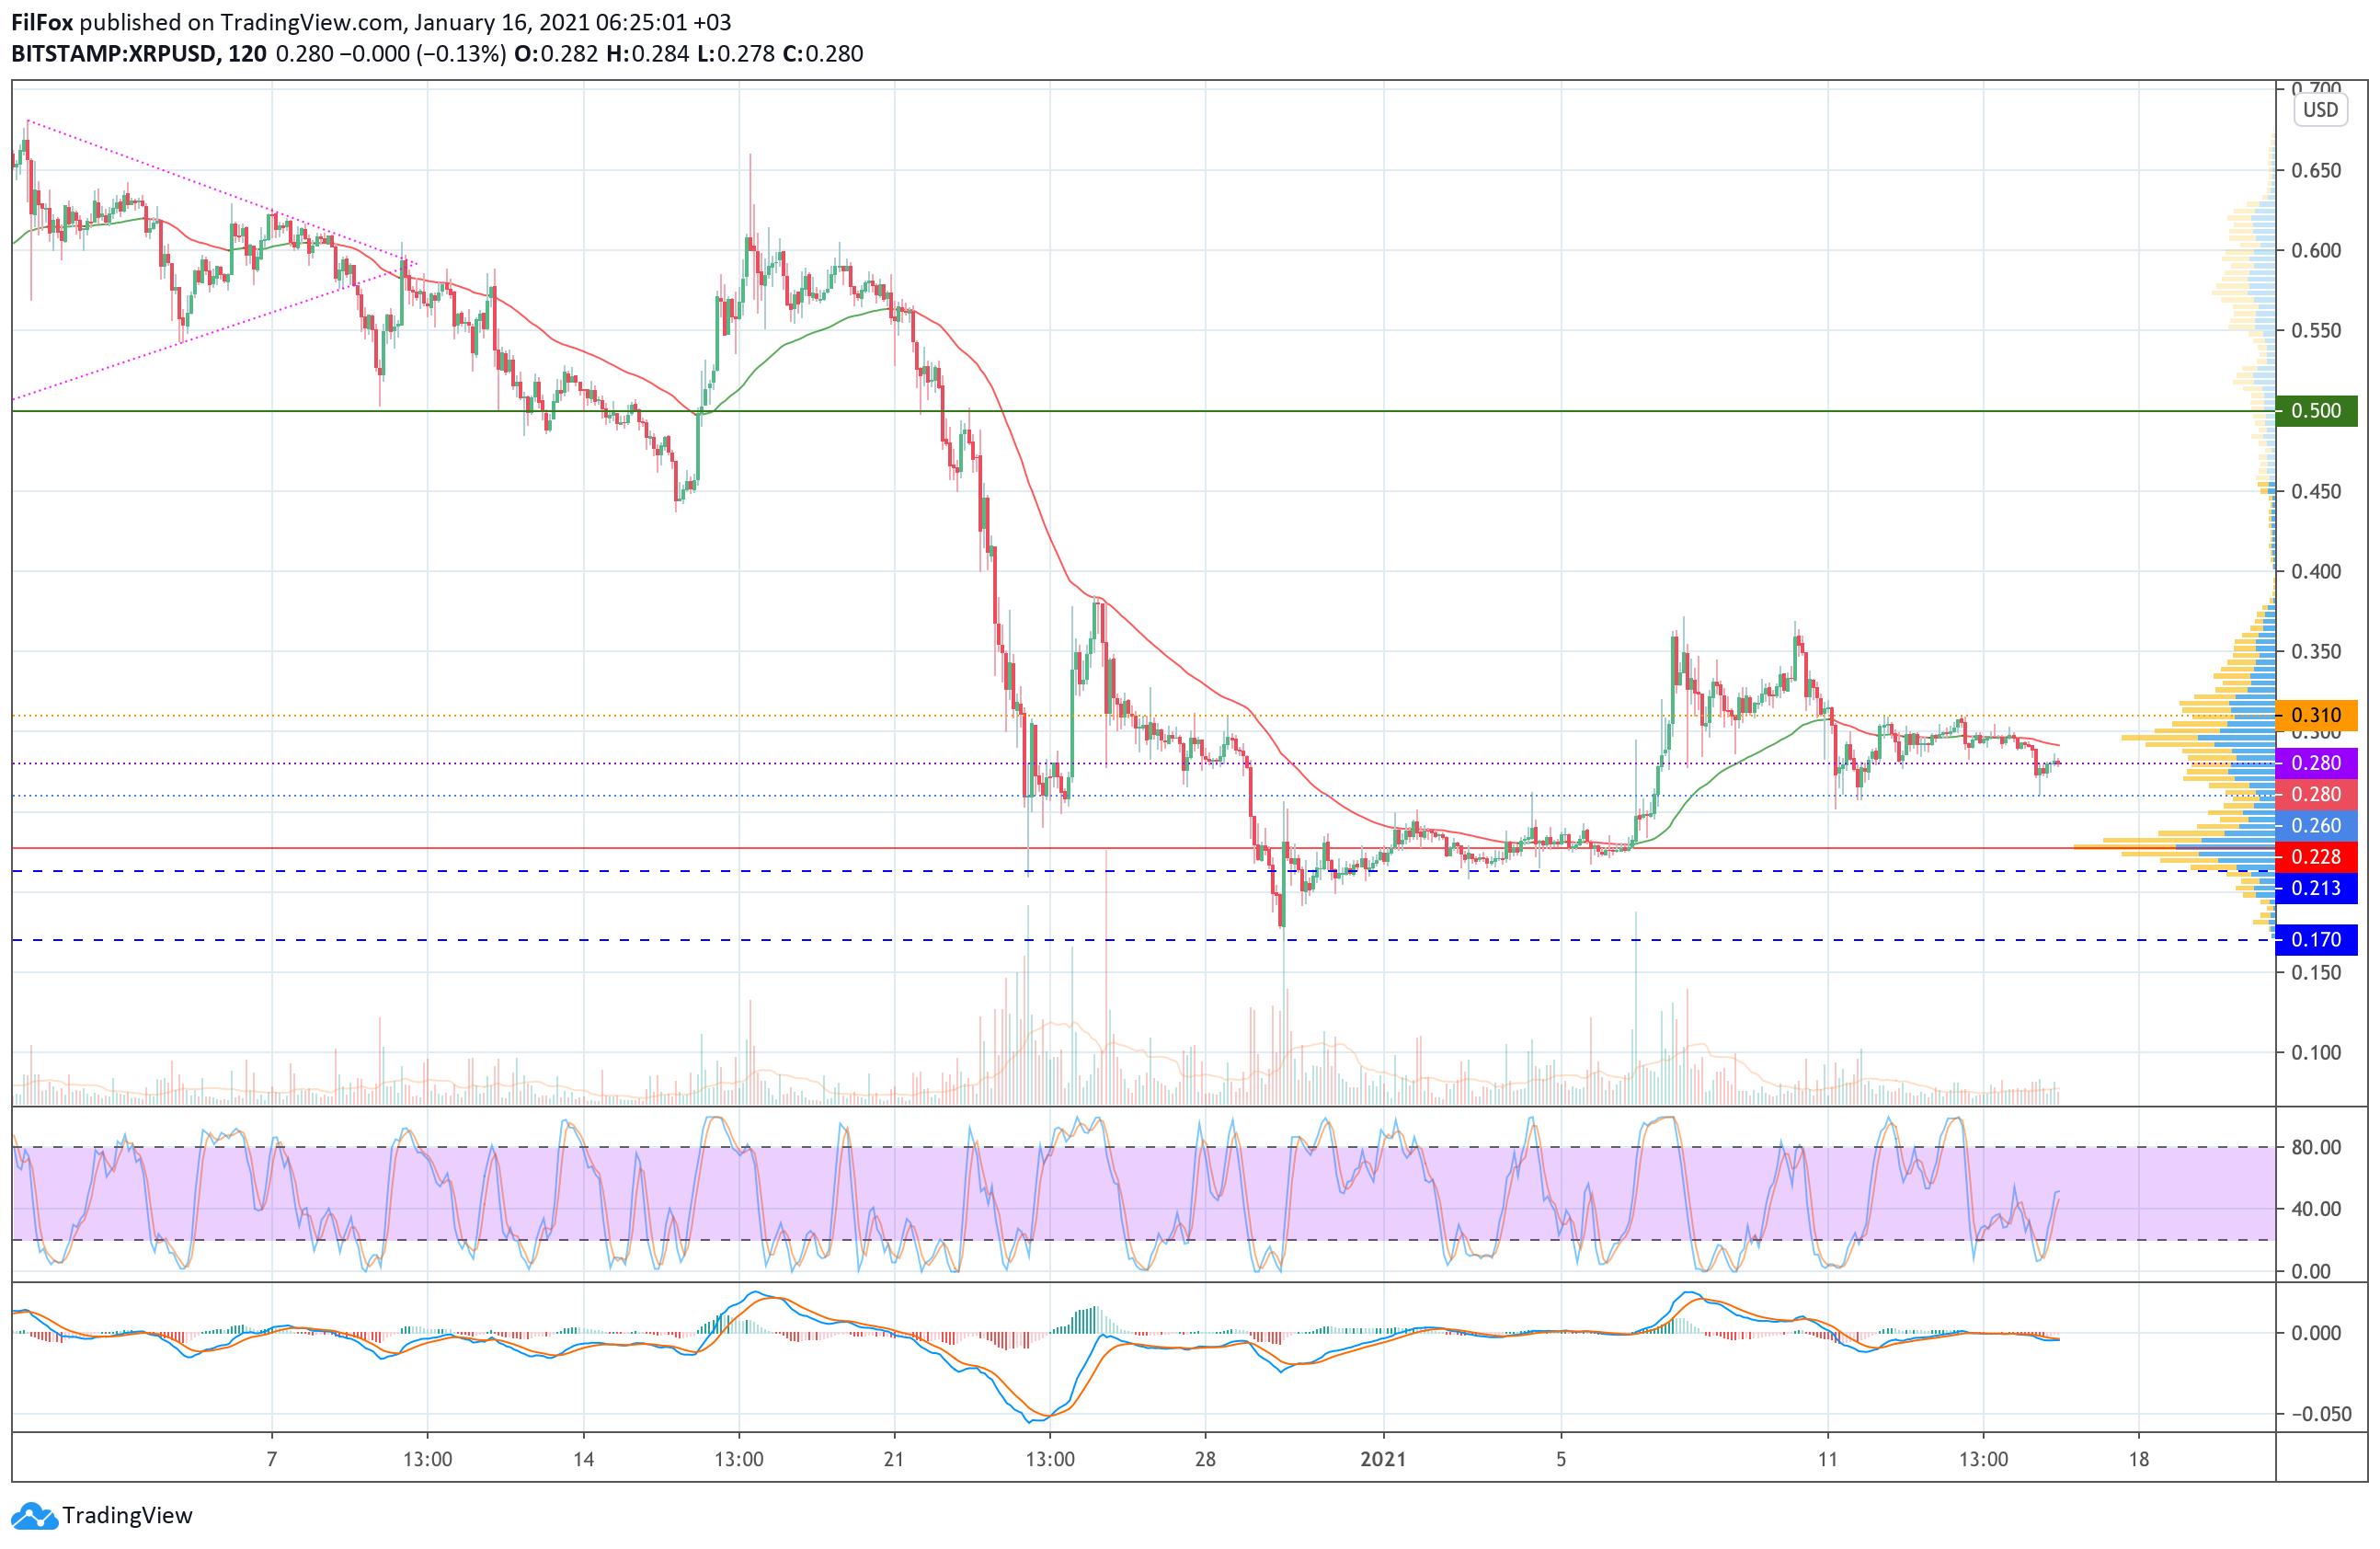 Анализ цен Bitcoin, Ethereum, Ripple на 16.01.2021